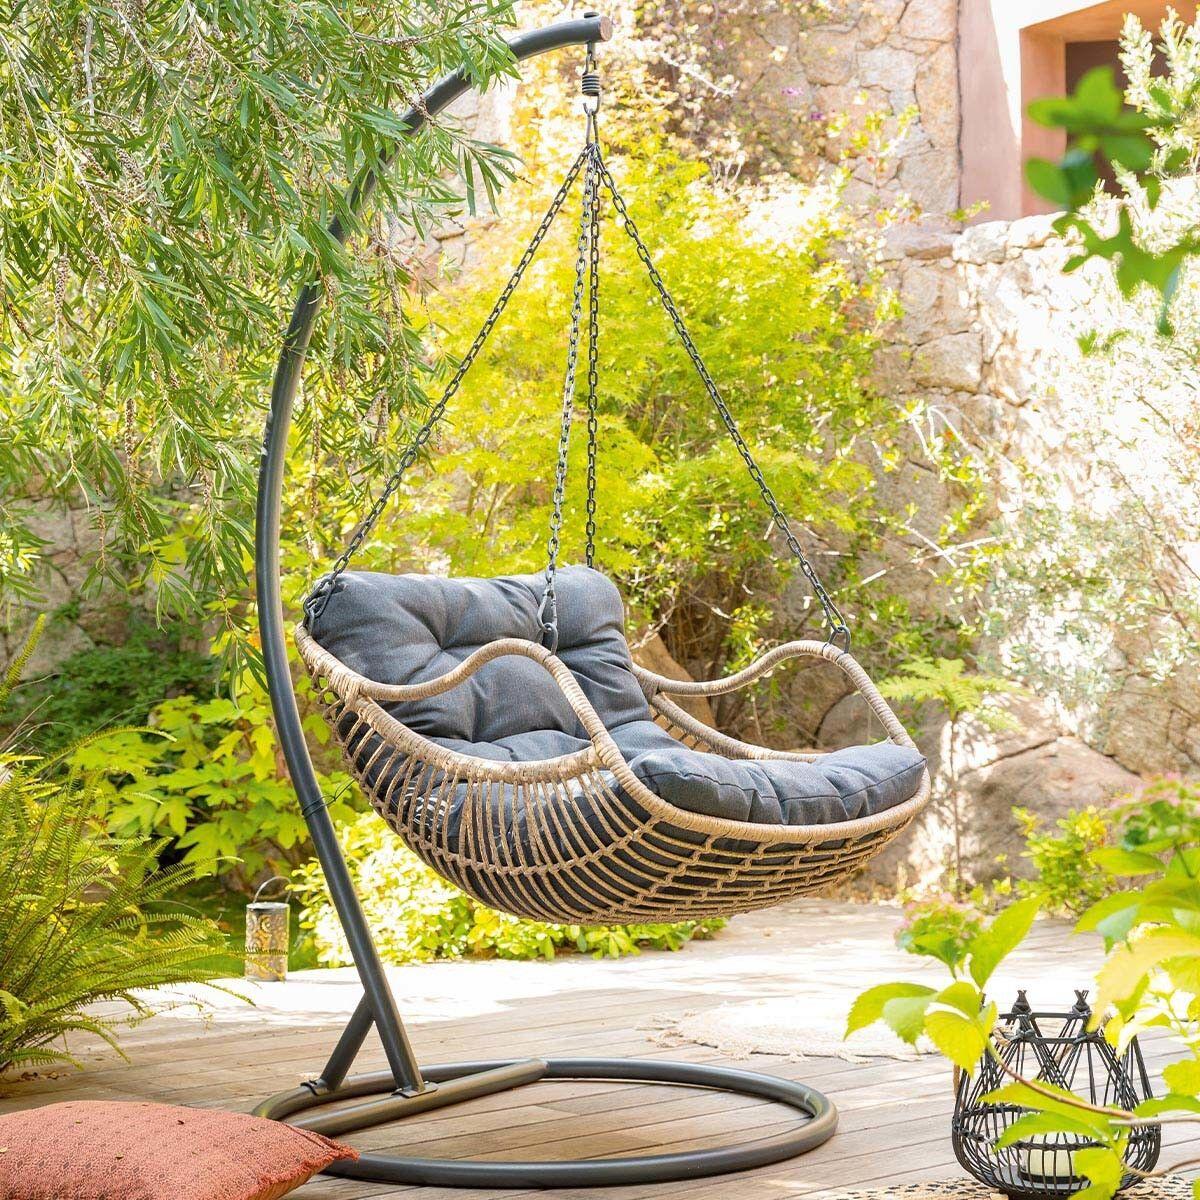 Hespéride Chaise de détente suspendue Gibraltar Jardin